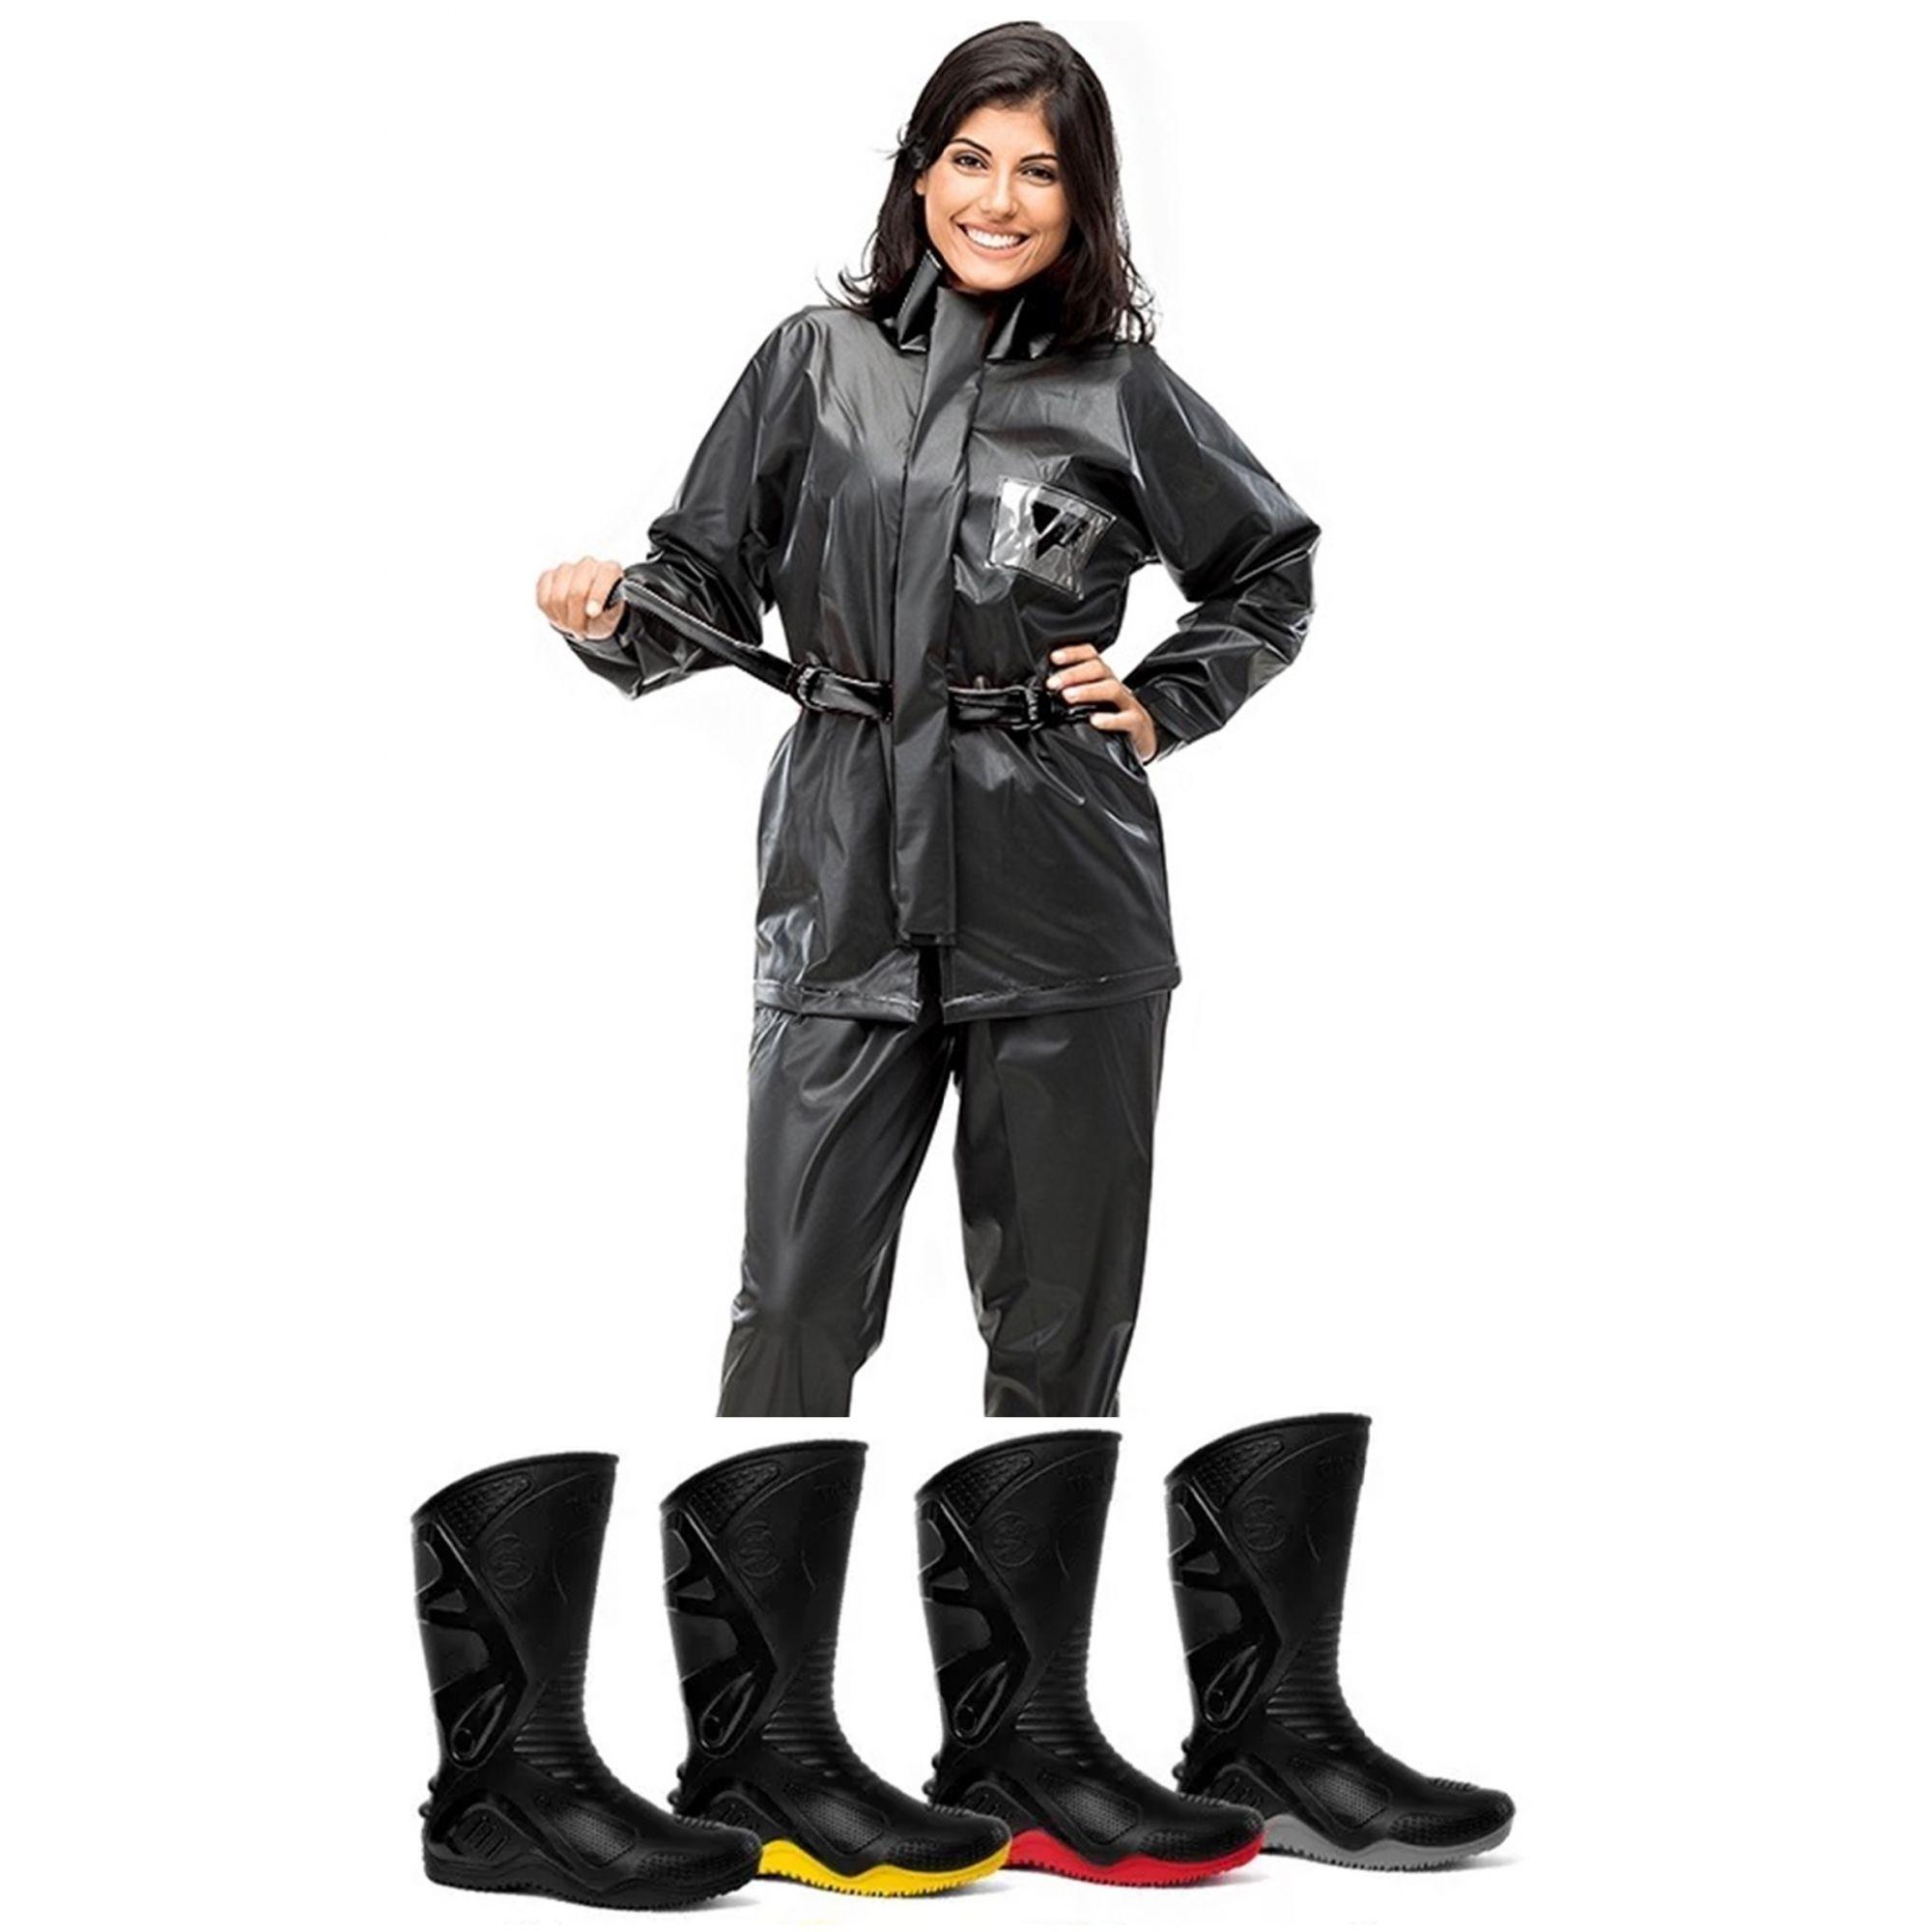 9d781bae1 Kit Capa de Chuva Feminina Pantaneiro + Bota Motosafe PVC Motociclista